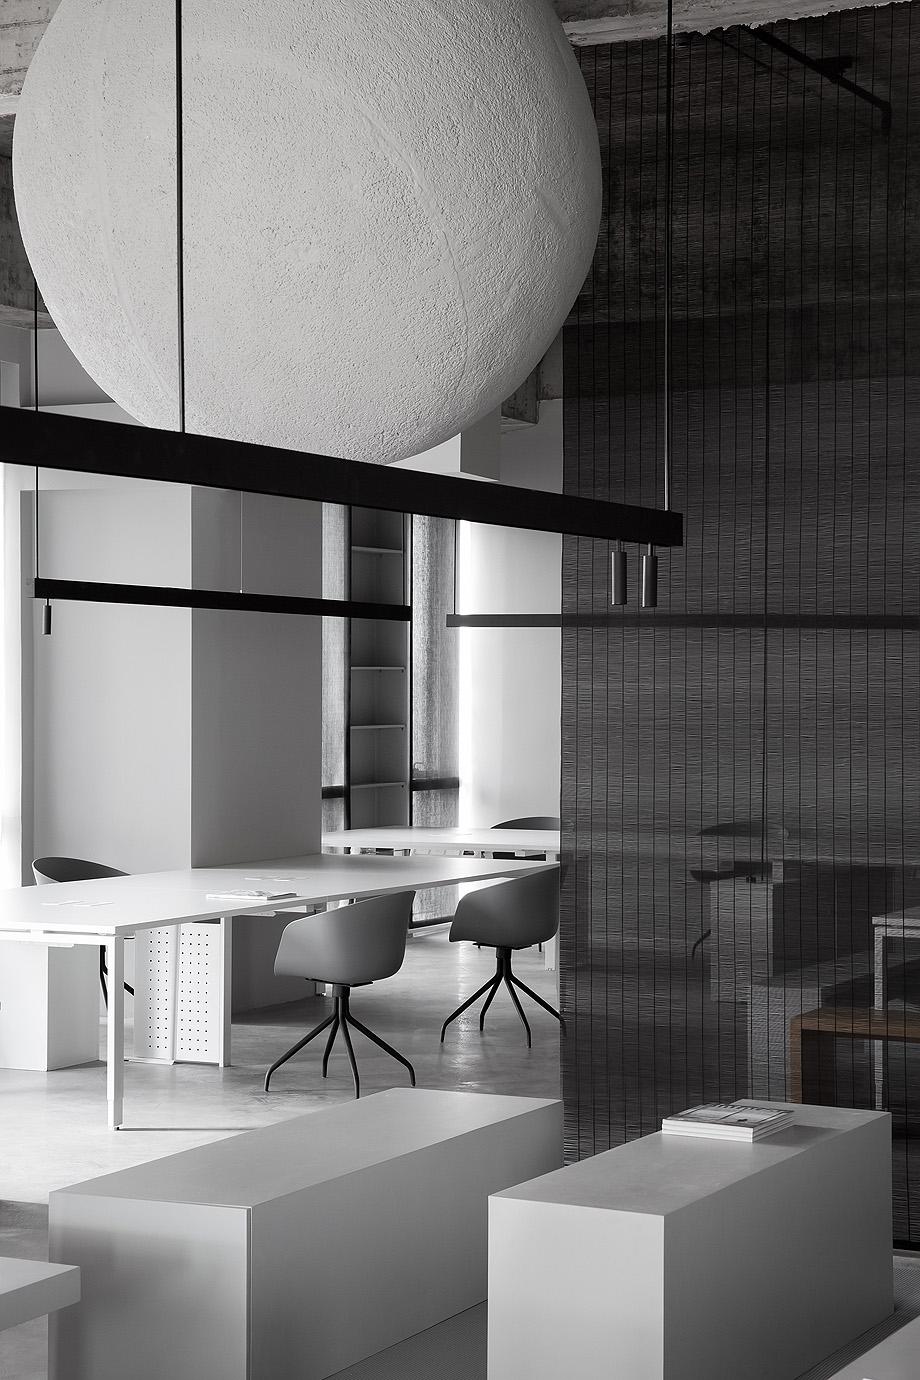 oficinas xzone de ad architecture - foto ouyang yun (14)